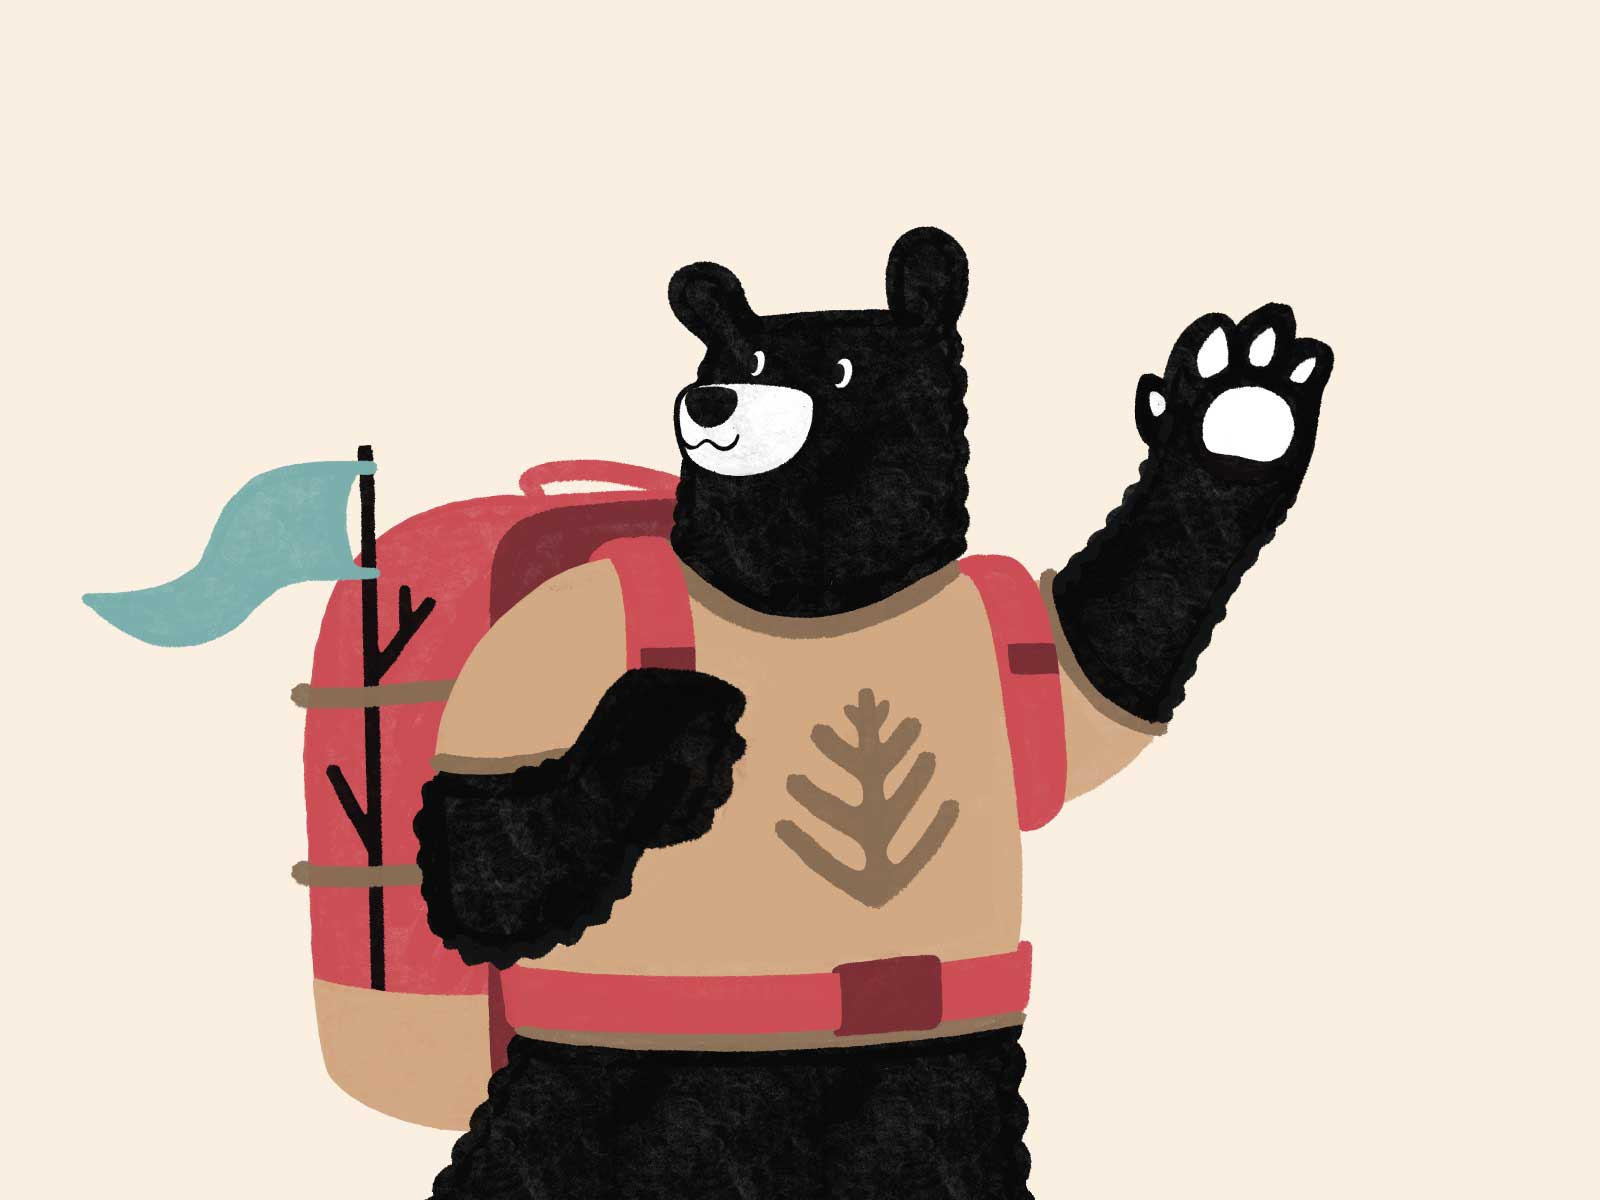 Illustration for Merchandise Design Designed by Lucas Bell Graphic Designer in Victoria BC Canada